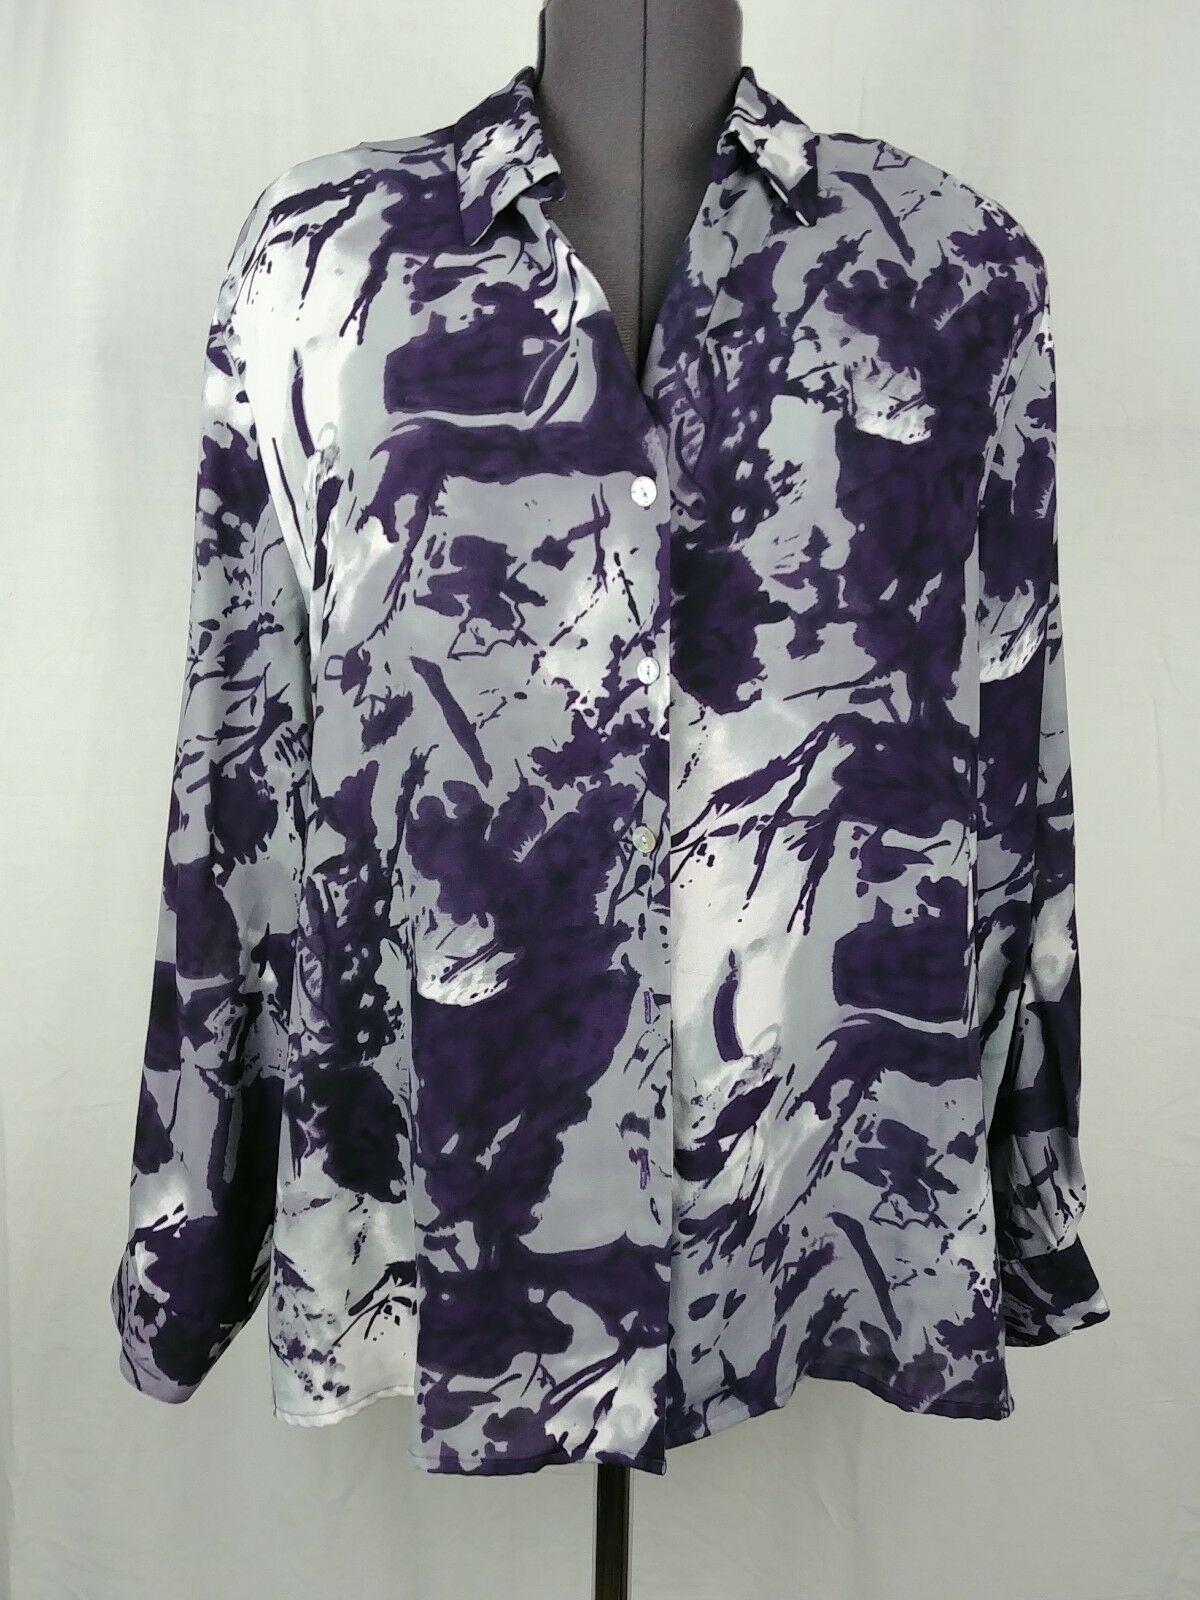 Dress Barn Womens Black & Gray Long Sleeve Blouse Womens Plus Size 2X